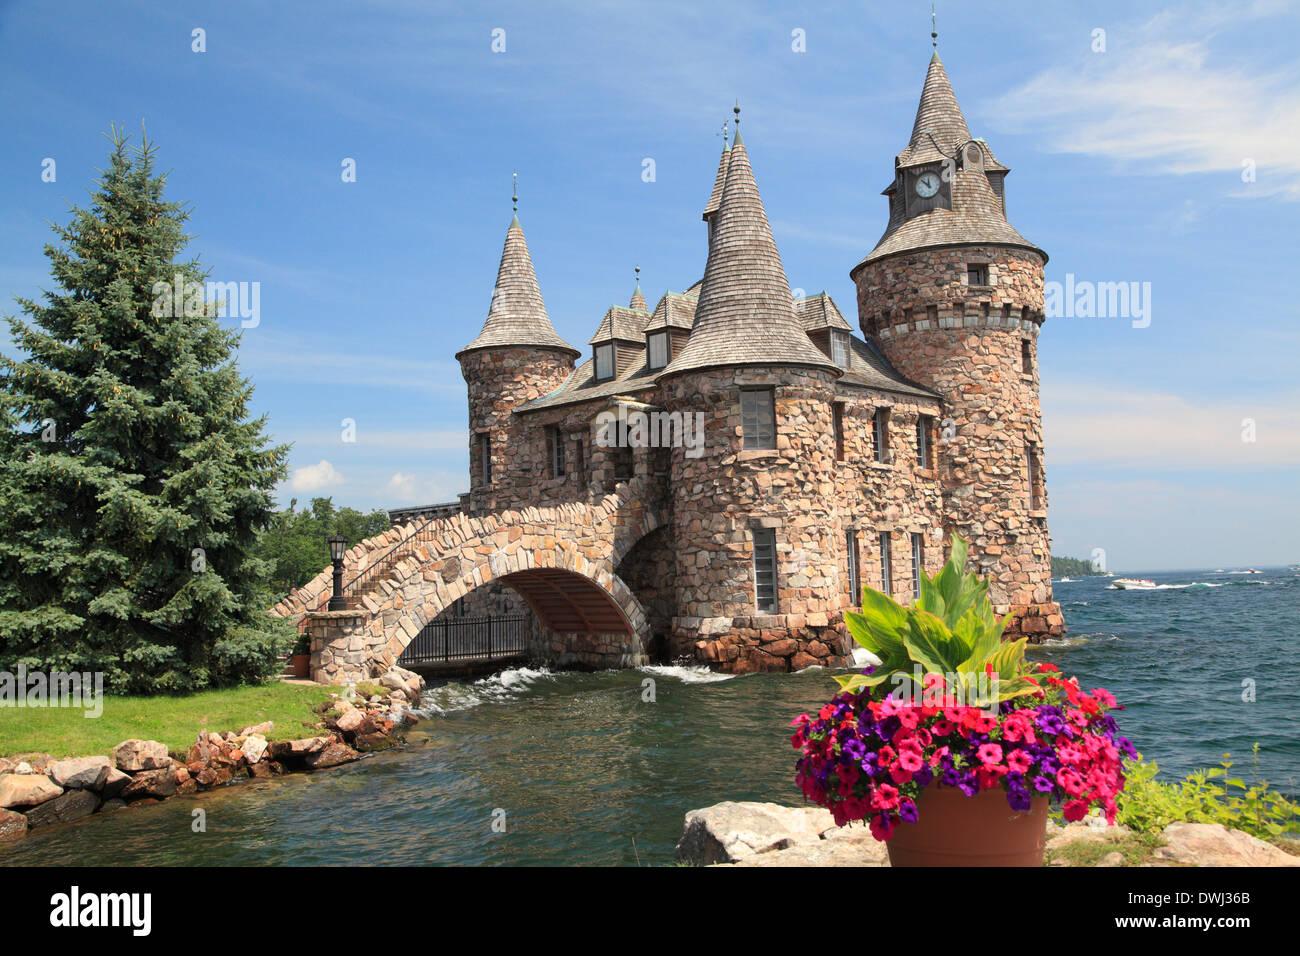 Hom Design Power House At Boldt Castle Thousand Islands New York